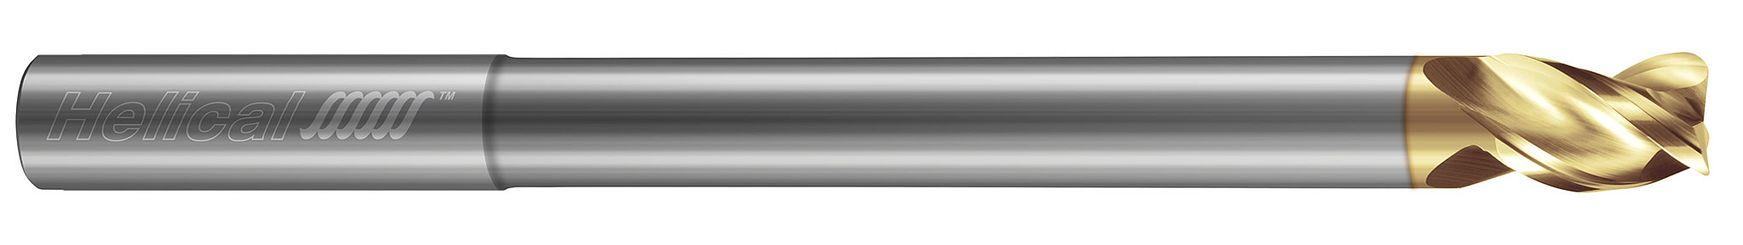 tool-details-46086